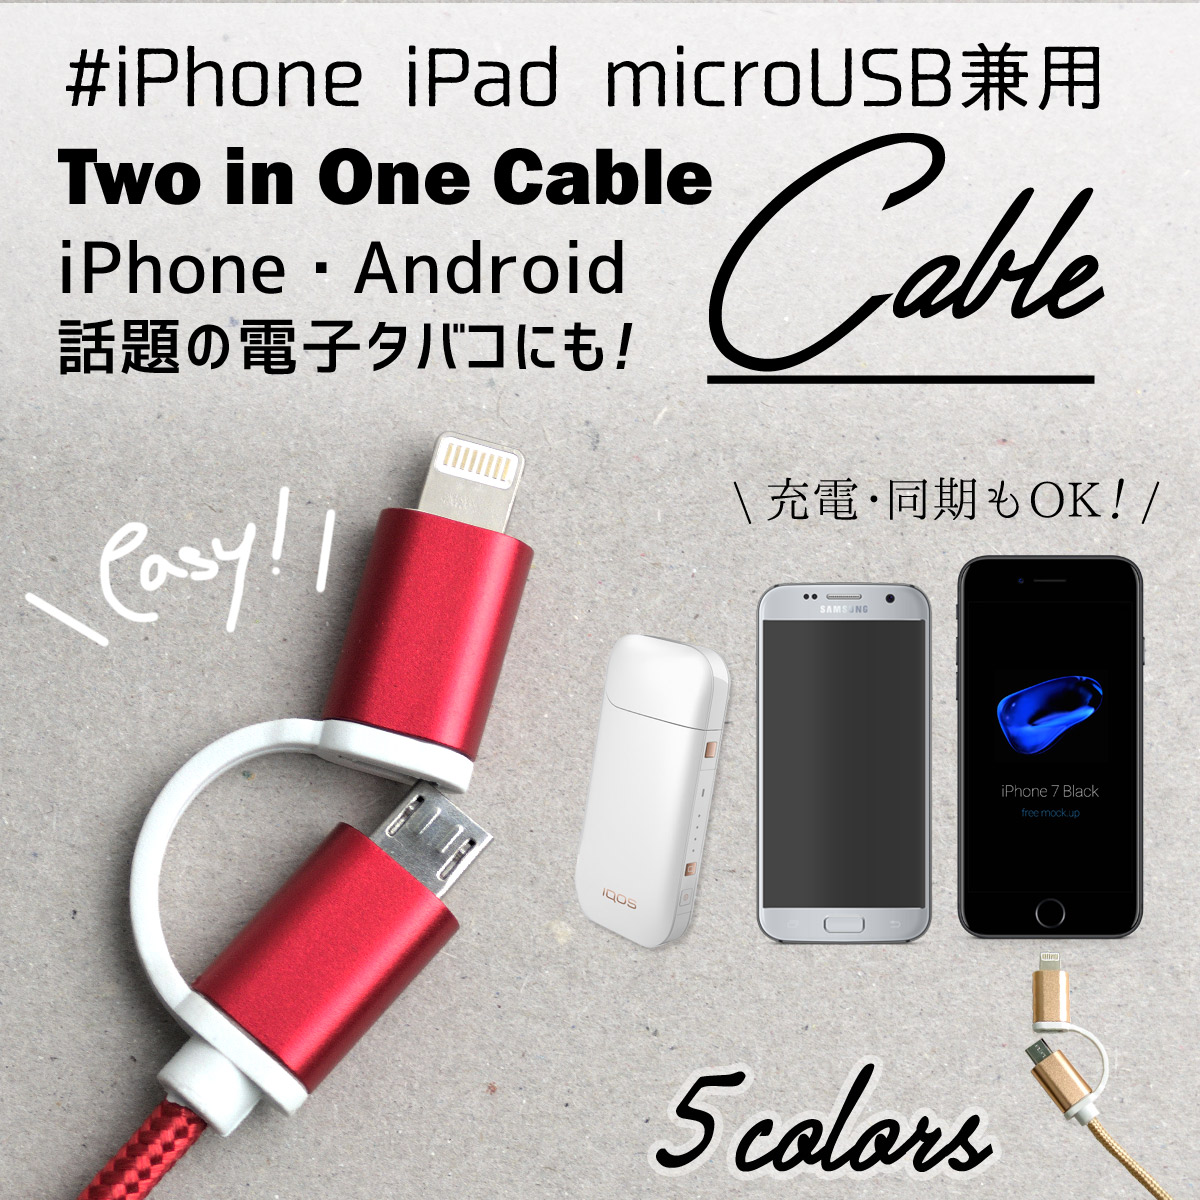 iPhone microUSB兼用ケーブル